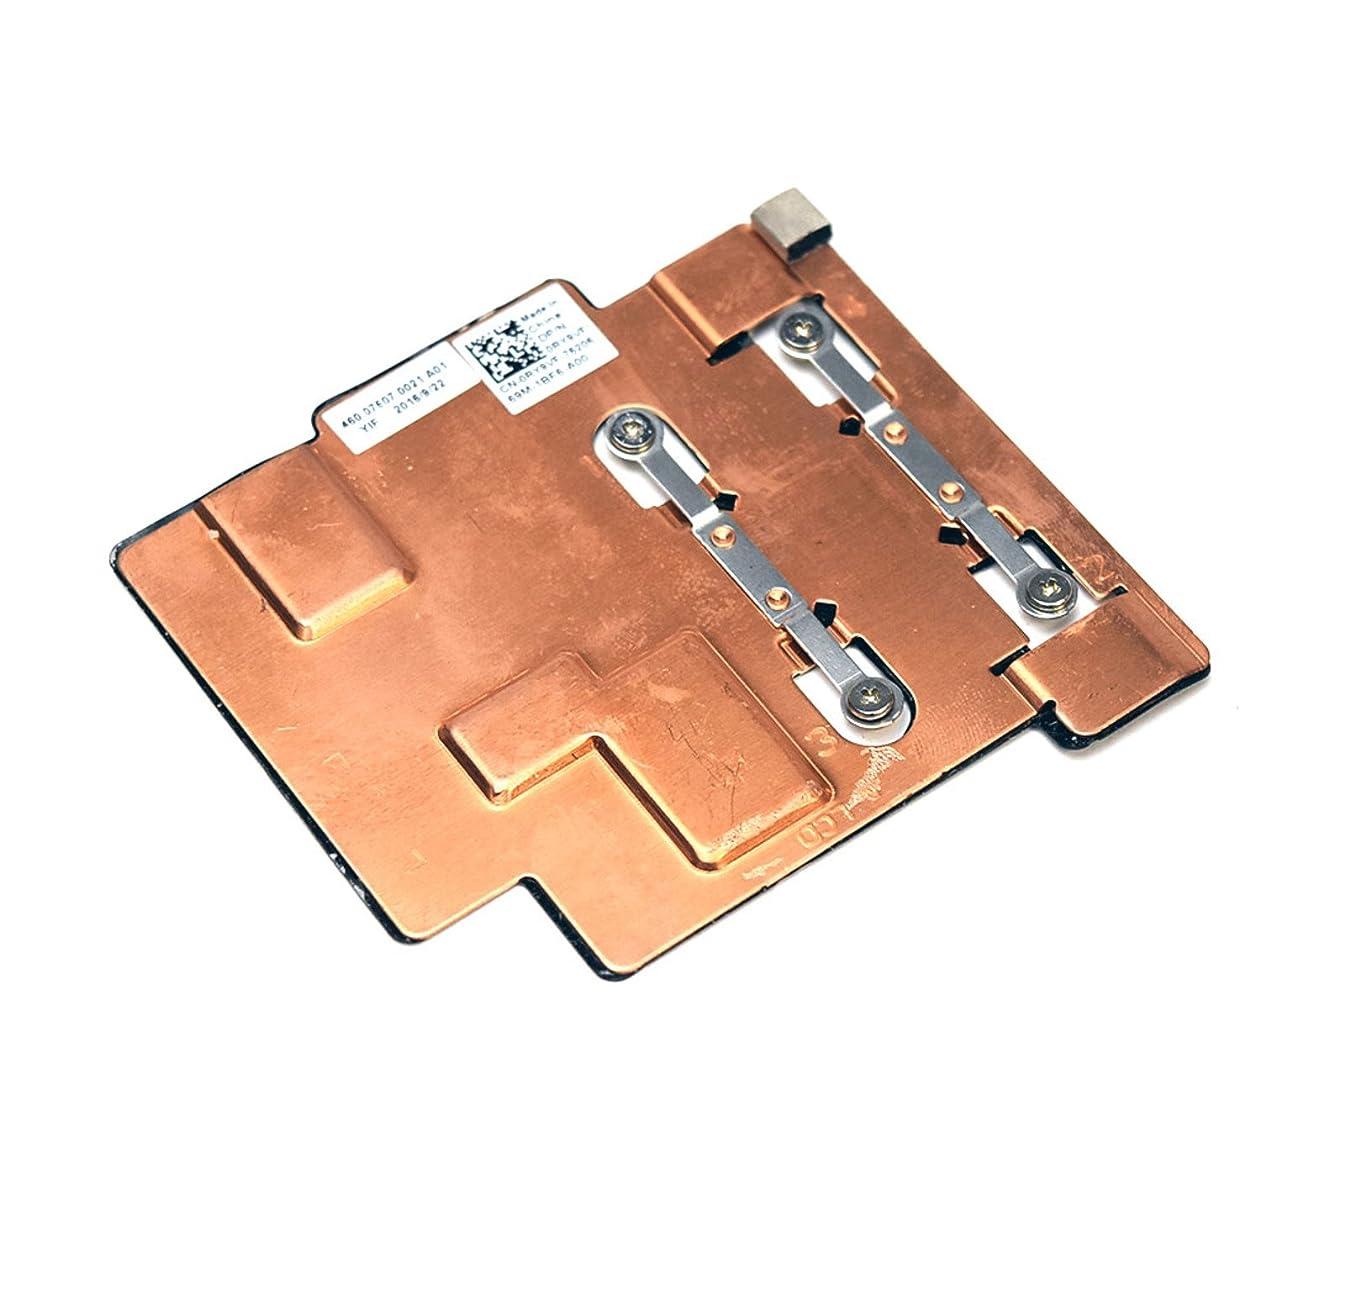 RY9VF Genuine OEM Dell Inspiron 11 3000 Series 3168 2-in-1 Laptop Notebook PC CPU Cooling Heatsink 460.07607.0021 Copper Plate Module w/Captive Screws Black Tape Foam Pad